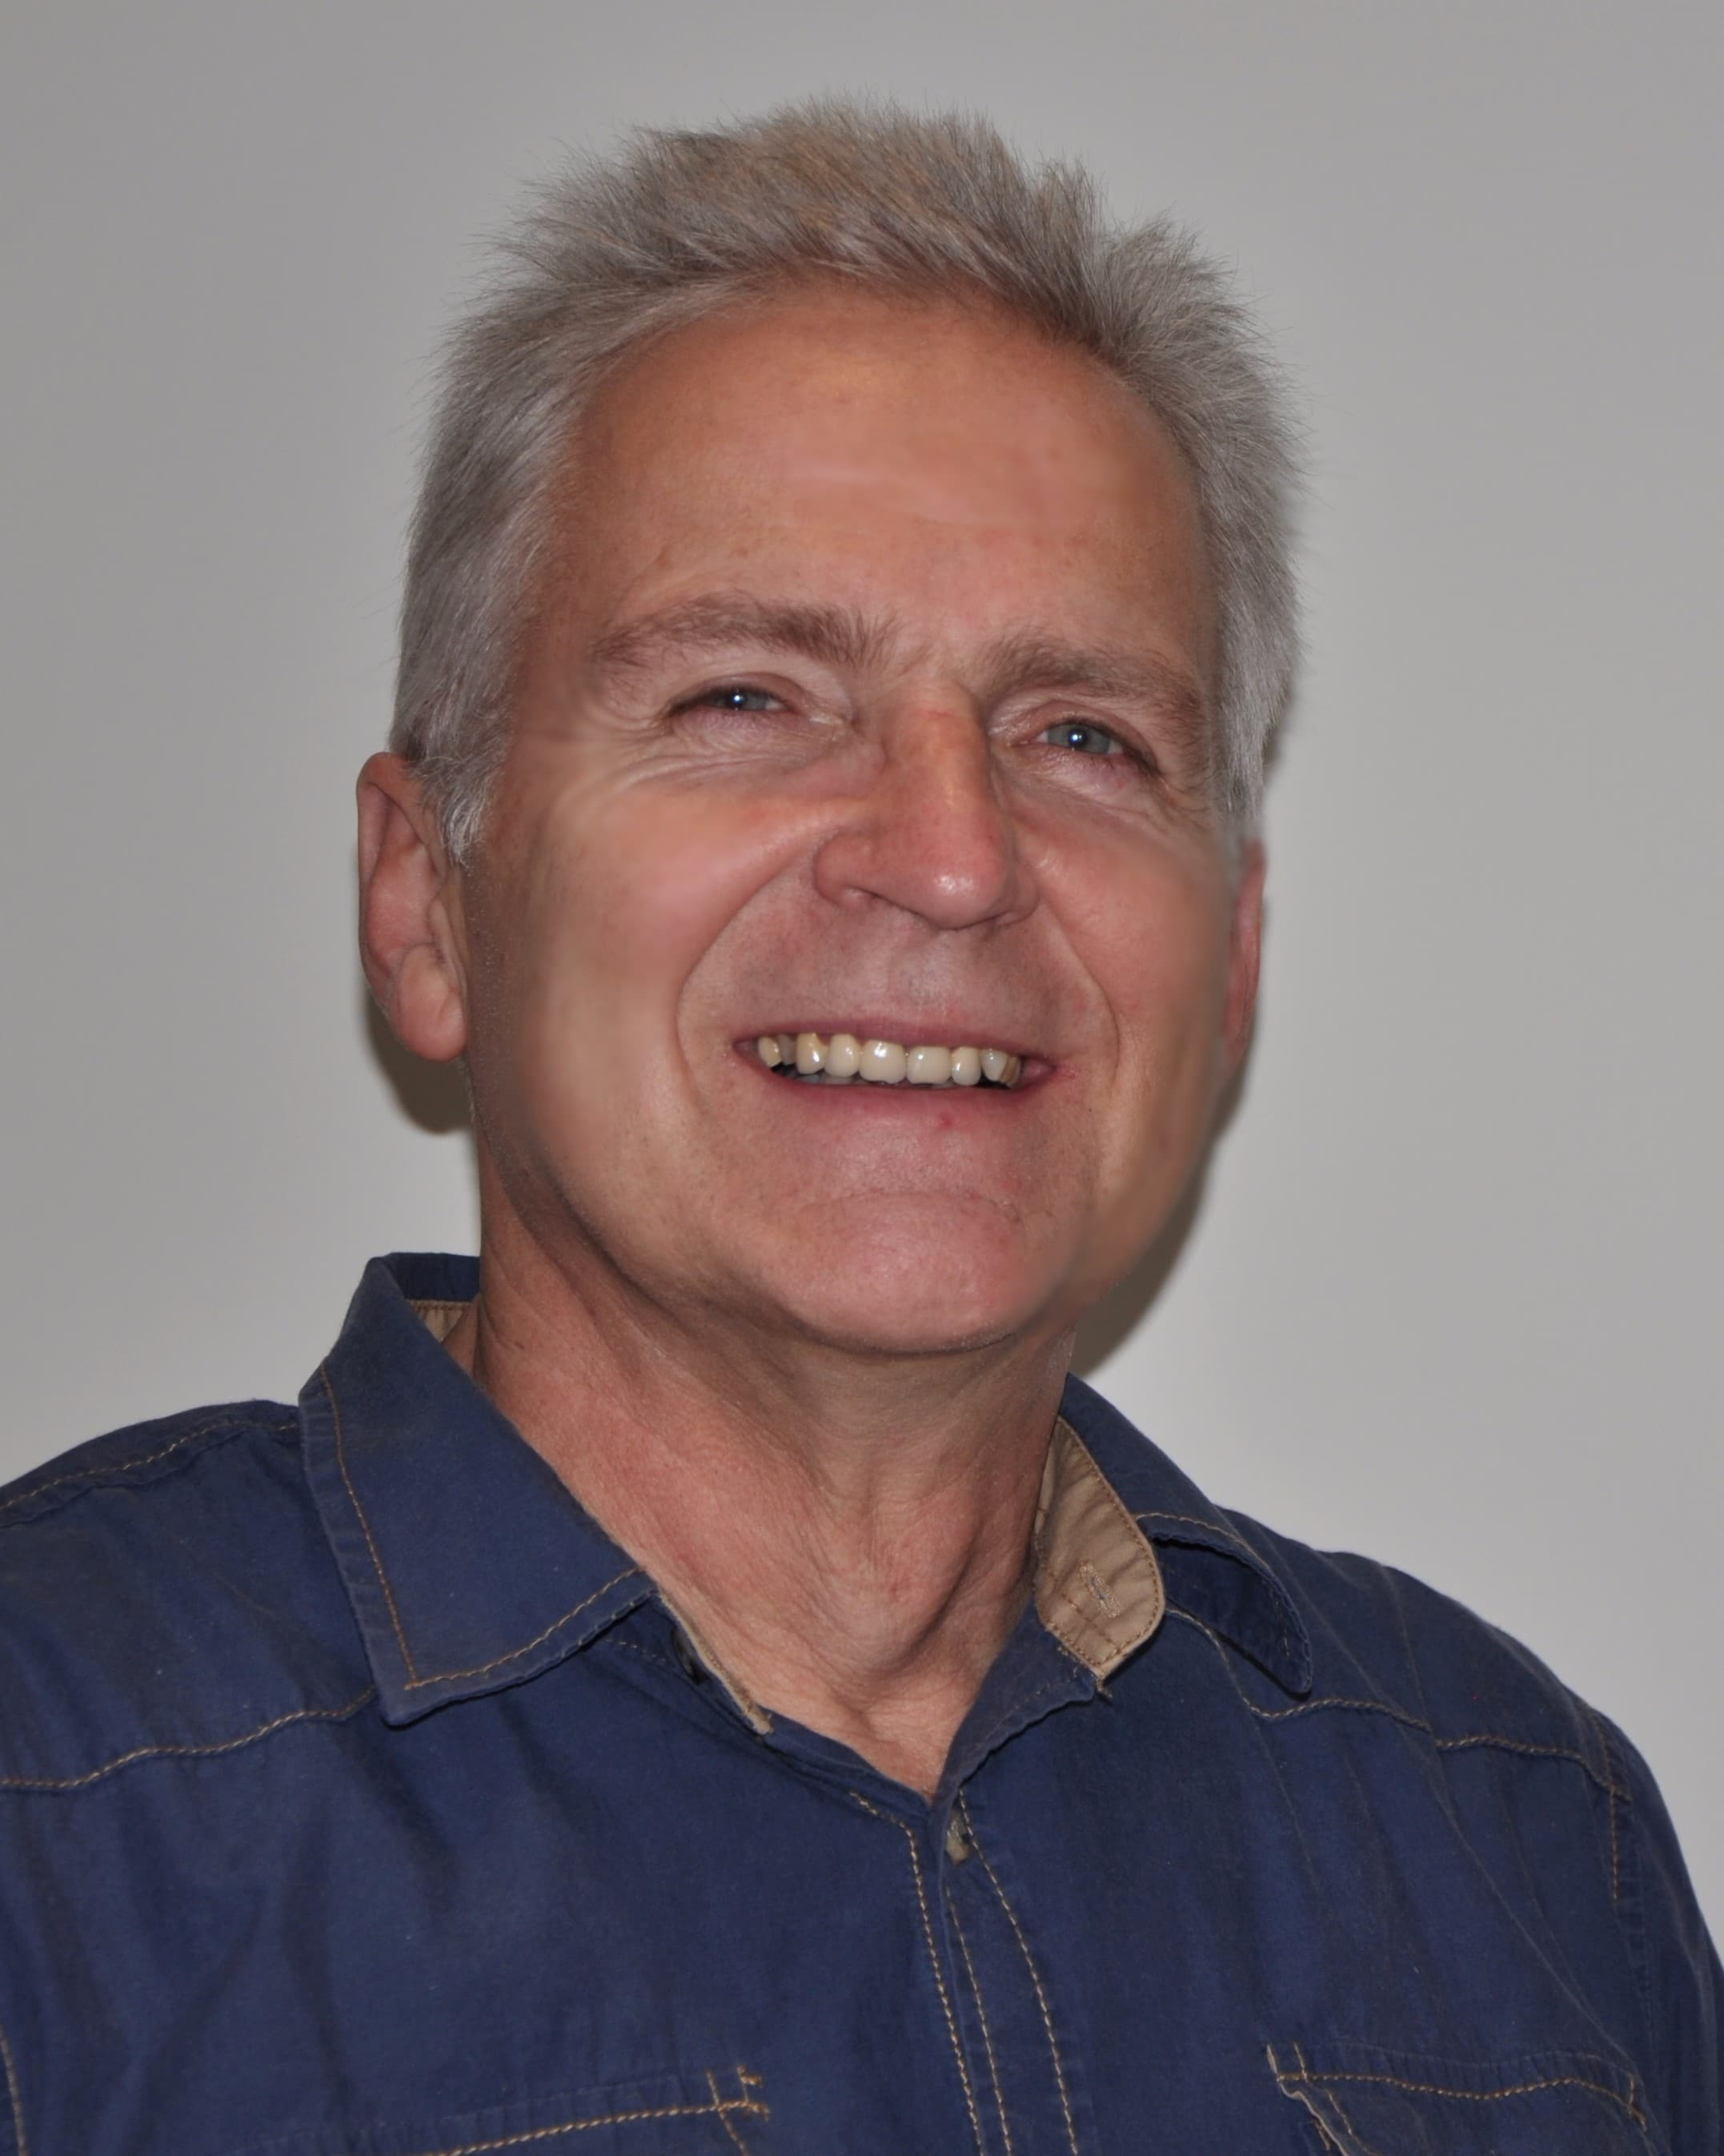 Karlheinz Wittmer